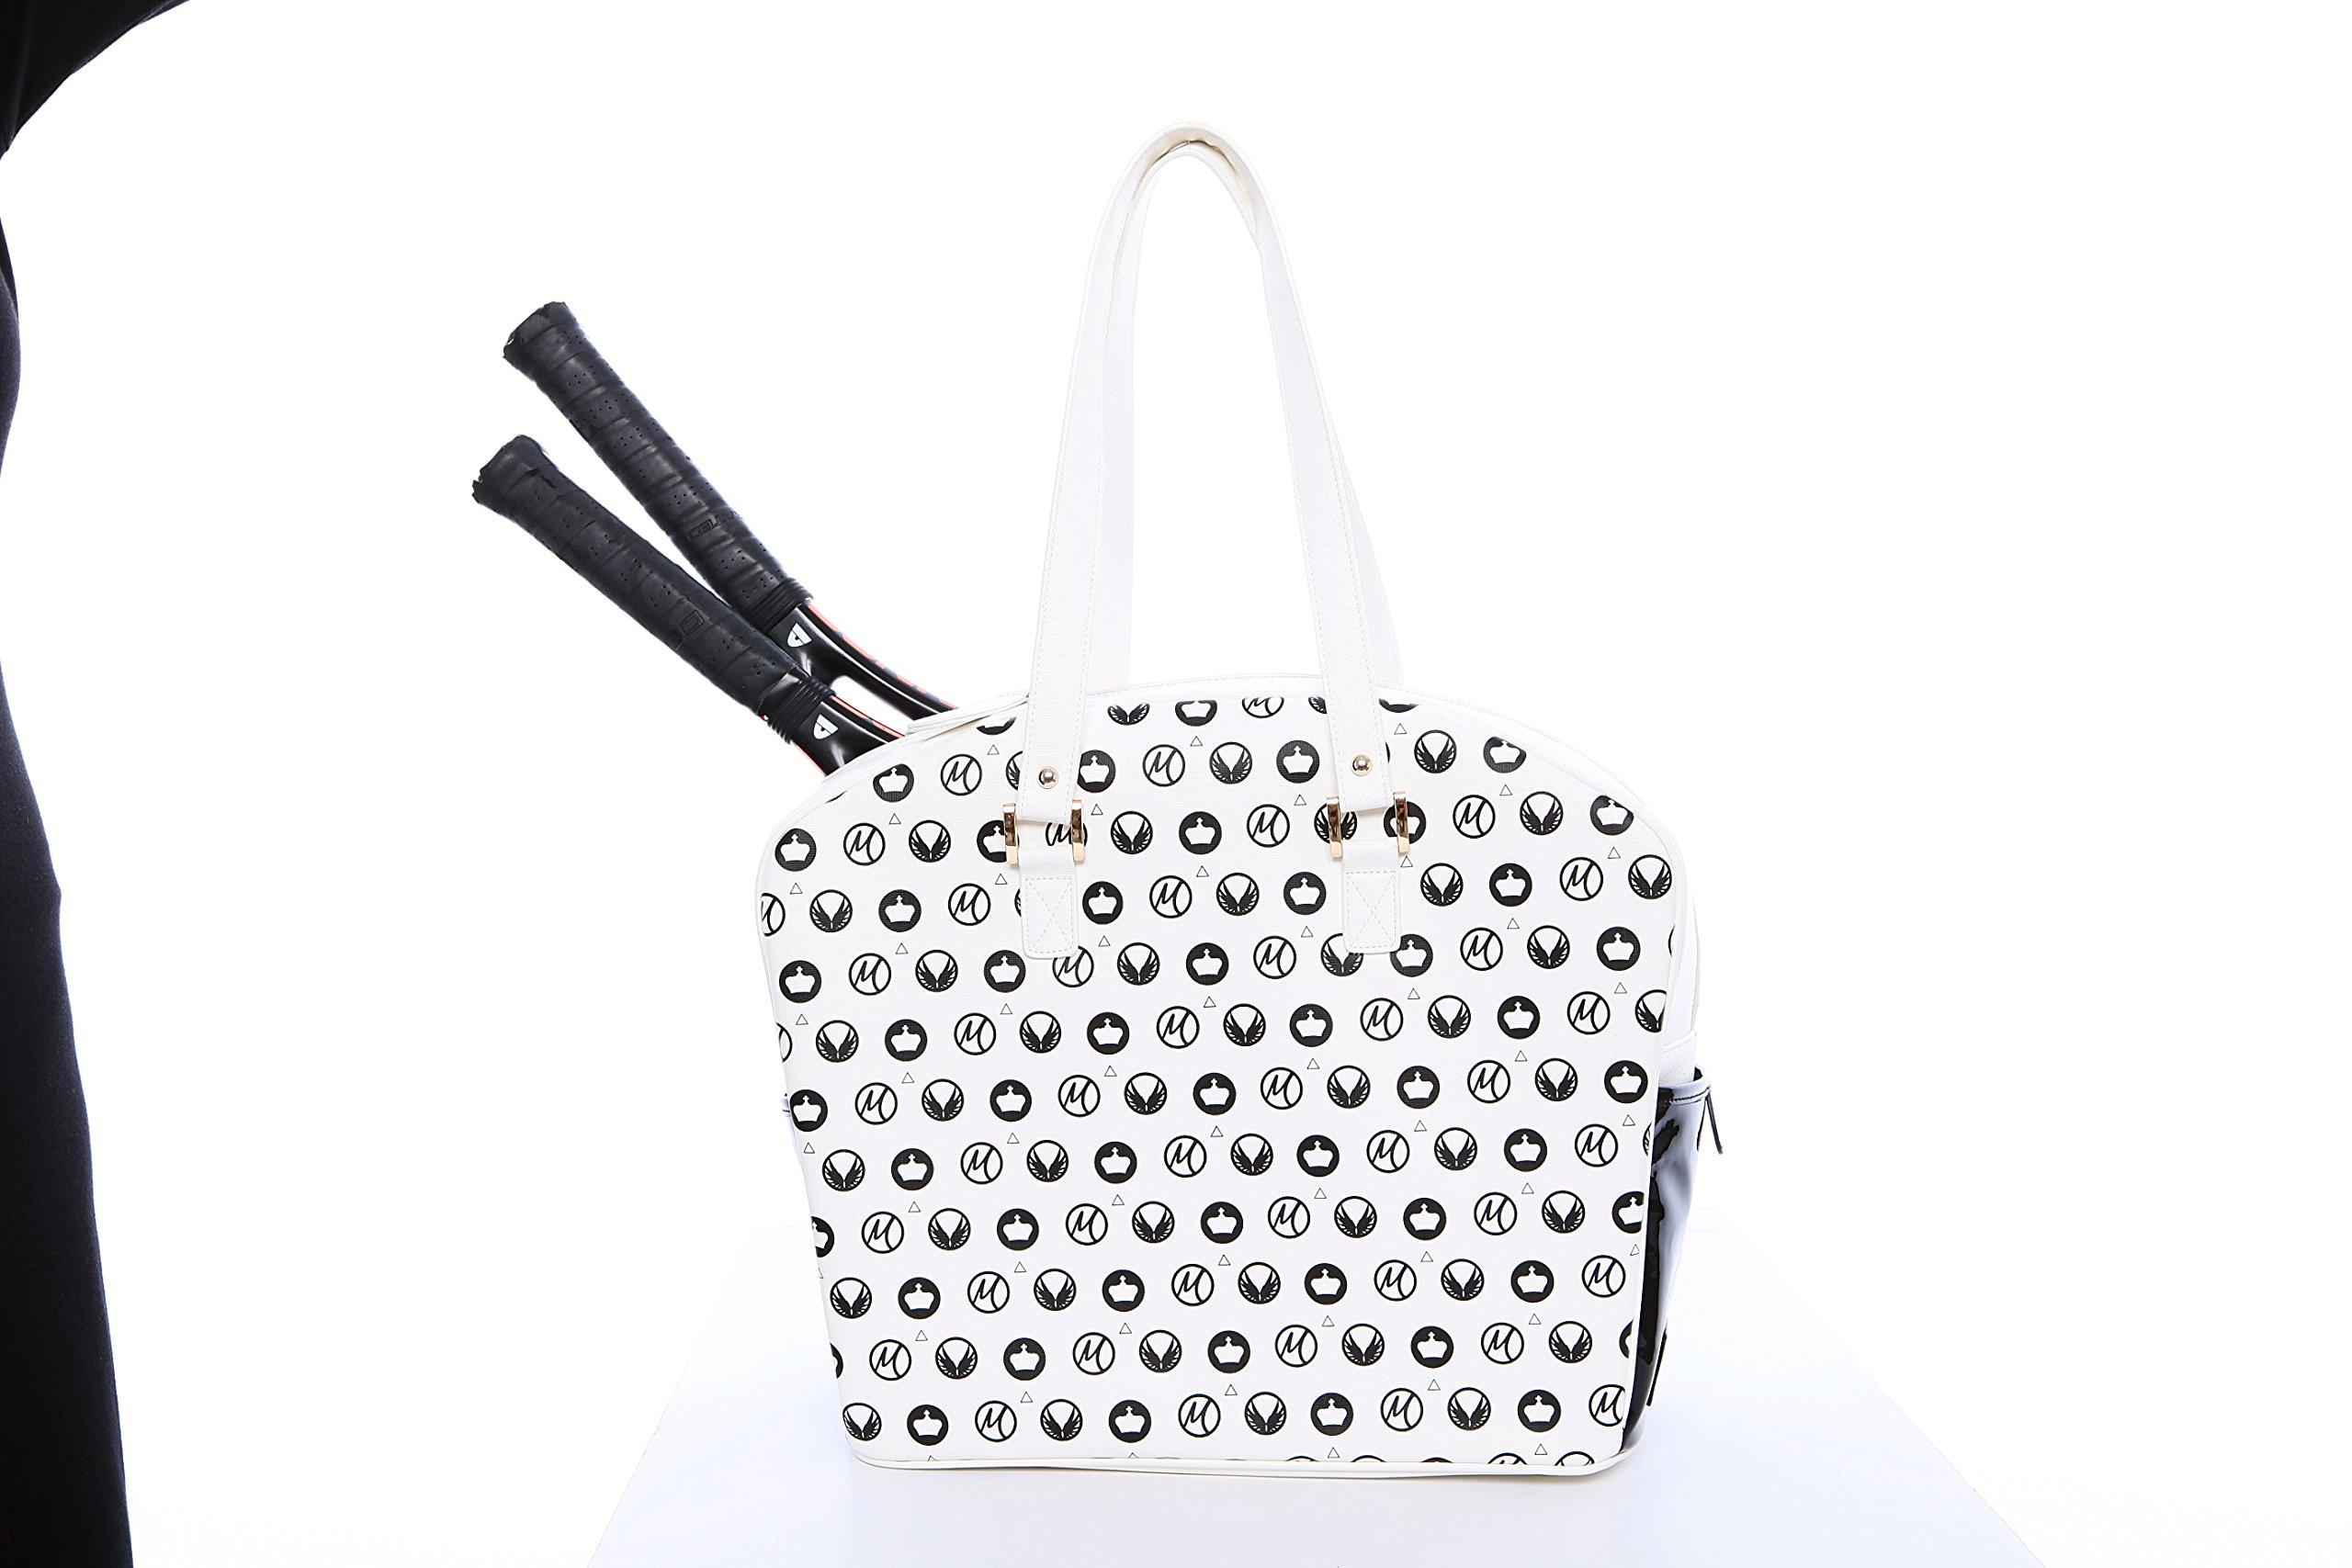 White Royal Designer Tennis Bag By Cortiglia Embellished By Marion Bartoli